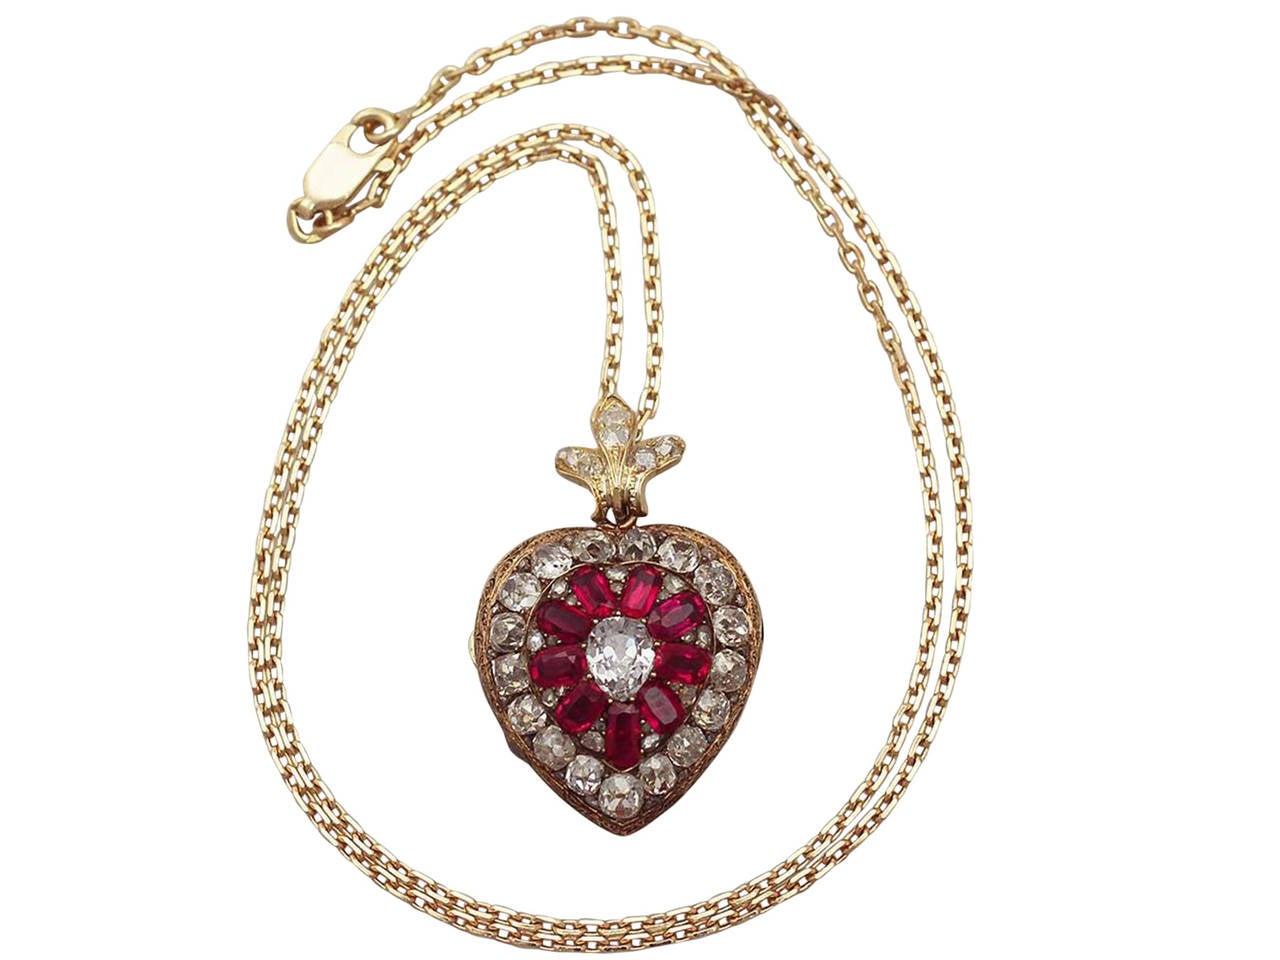 1880s Synthetic Ruby 4.55 Carats Diamonds Gold Pendant Locket 2